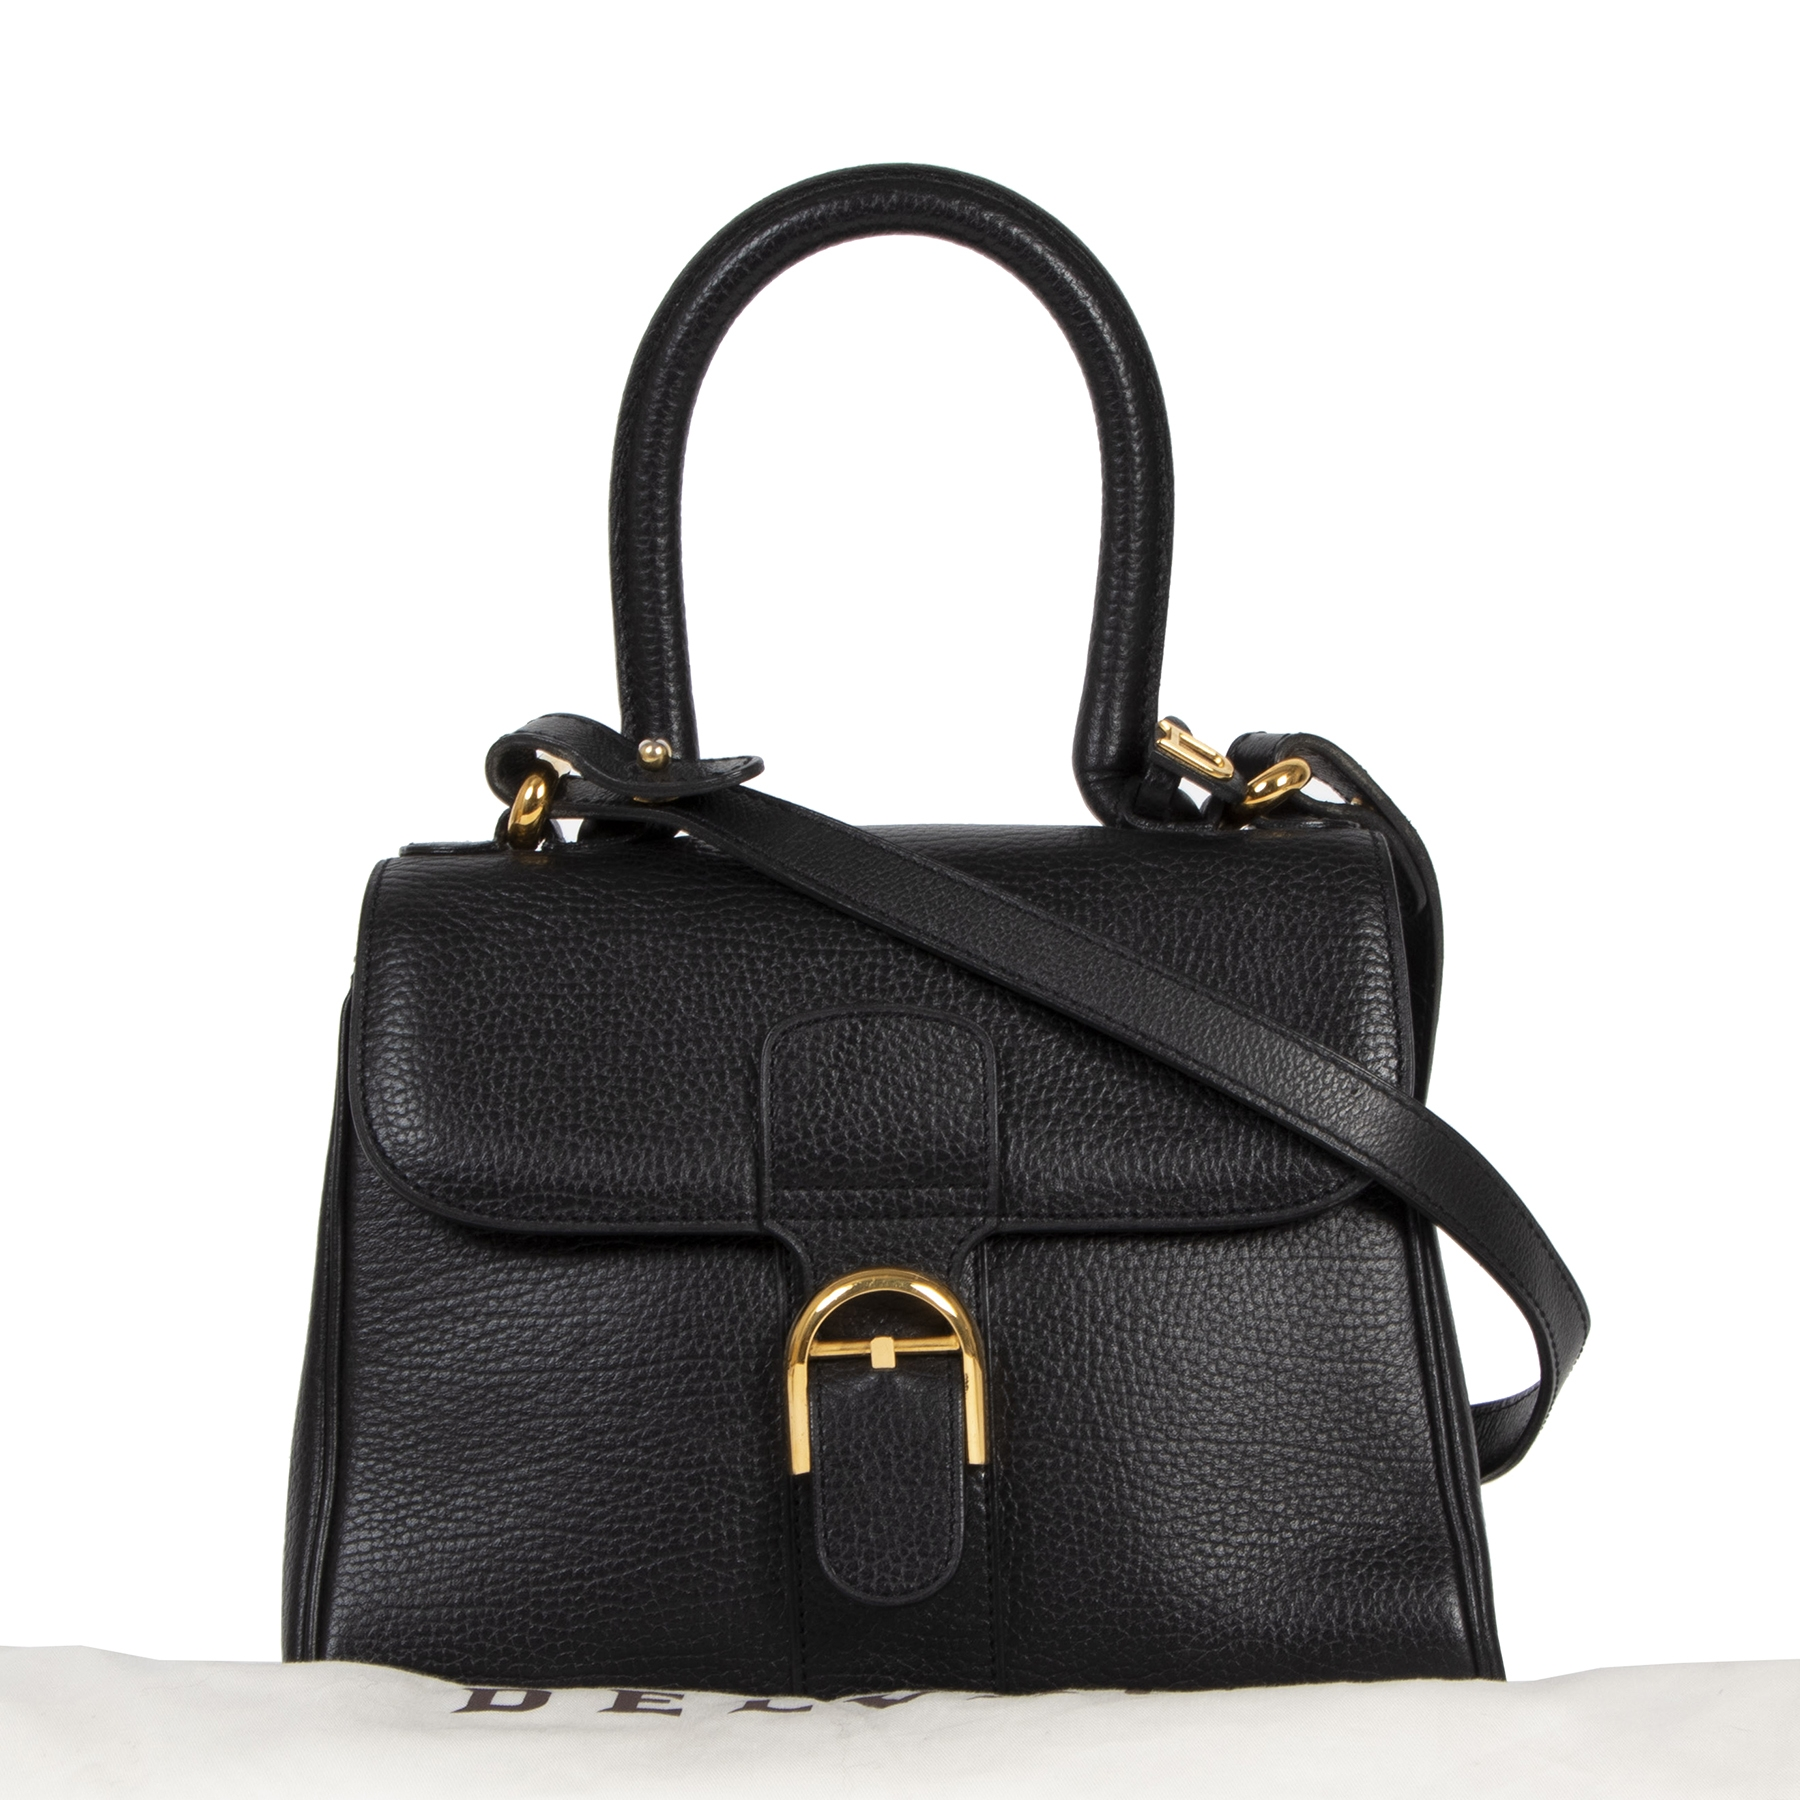 Authentieke tweedehands vintage Delvaux Black Mini Brillant Bag koop online webshop LabelLOV